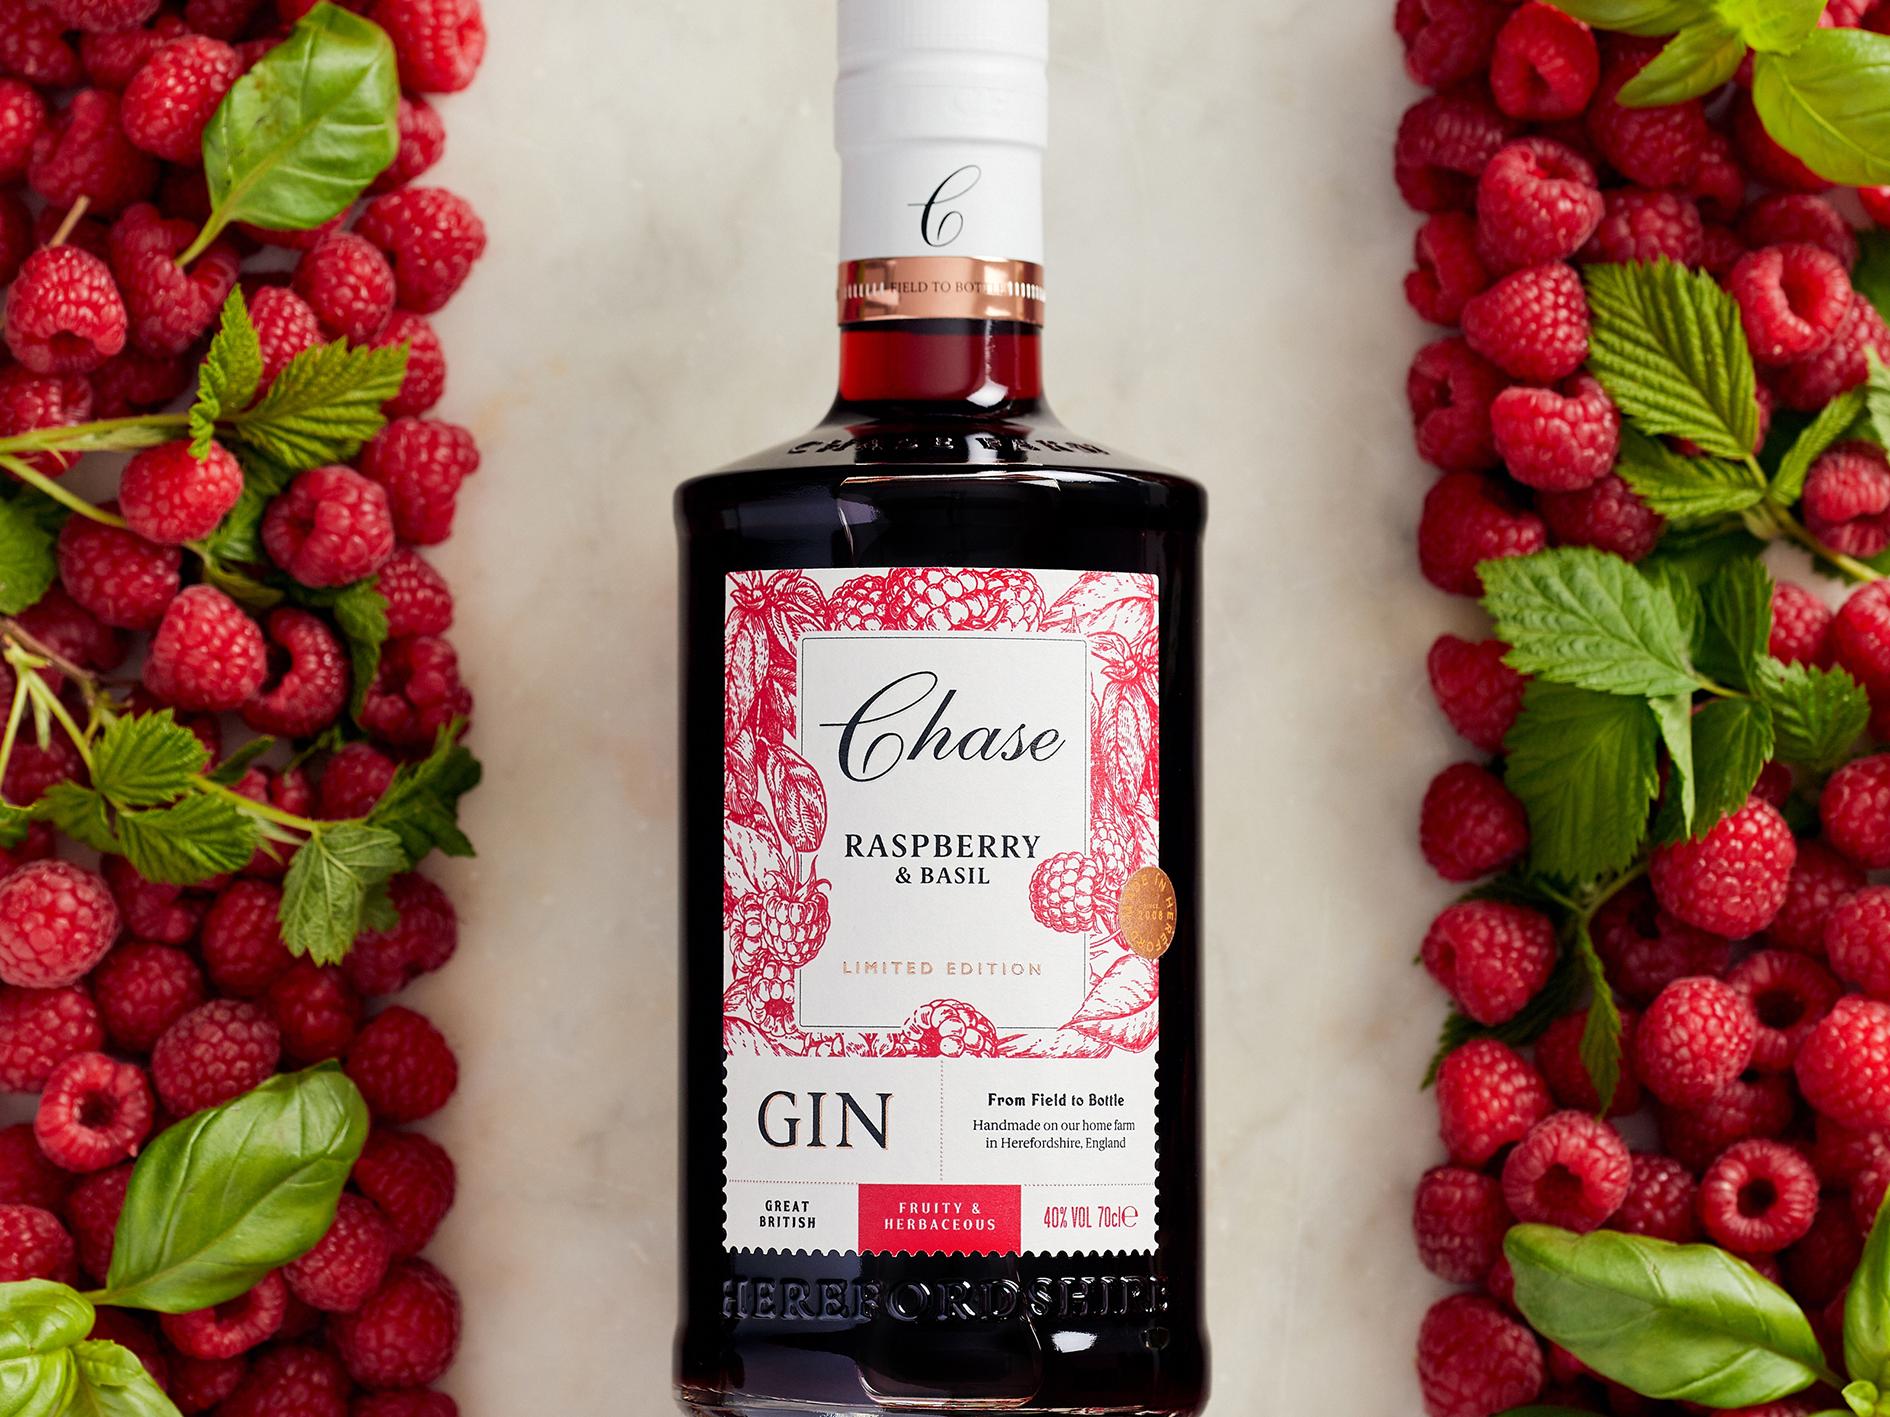 Chase Raspberry and Basil Gin